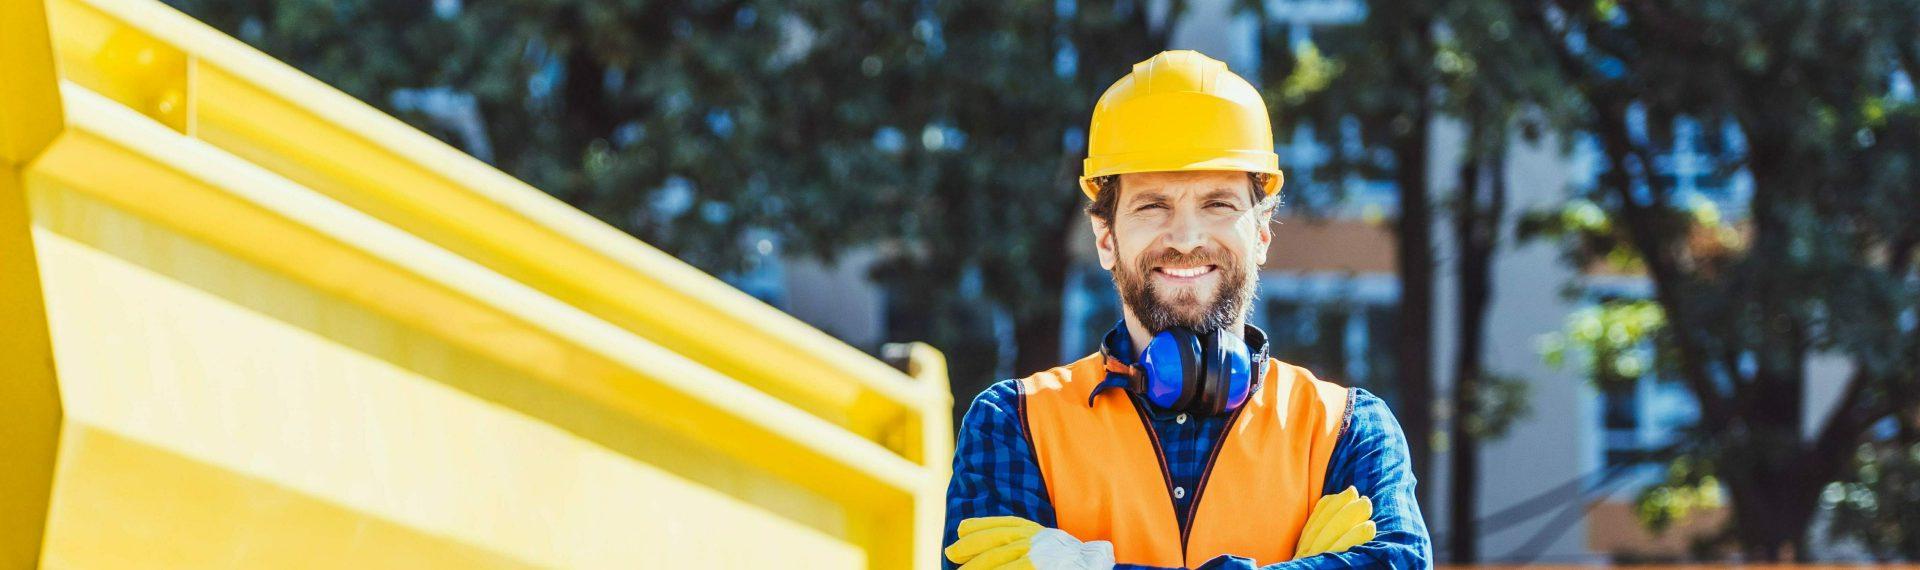 tradesmen hard hat builders